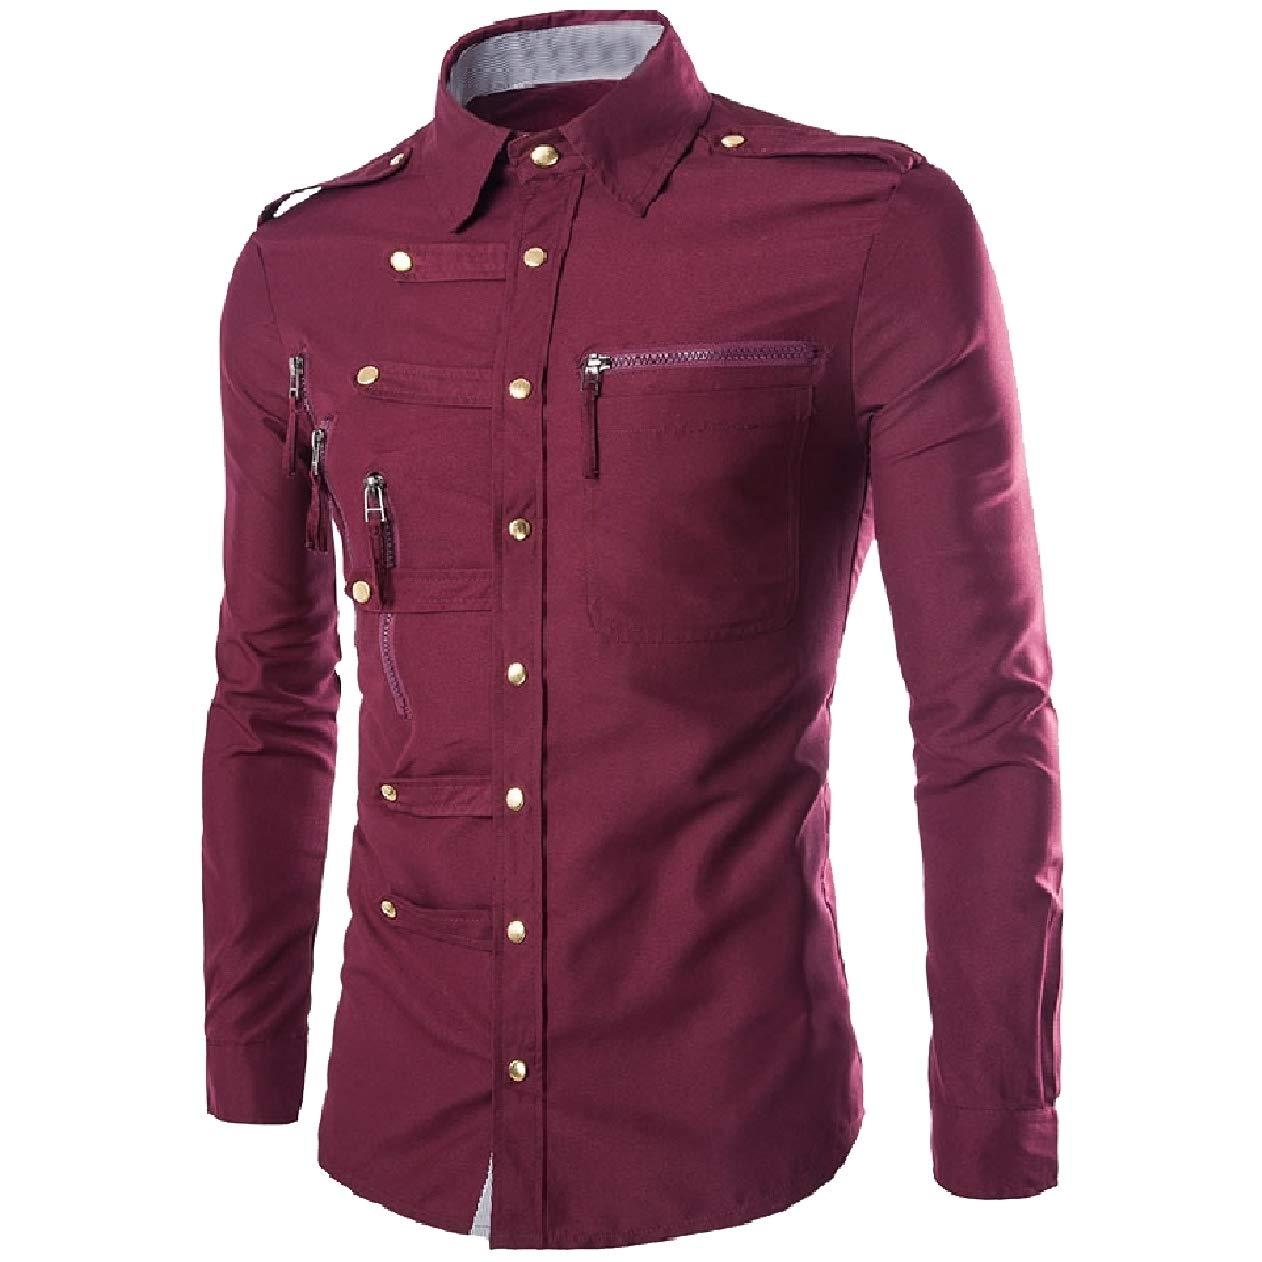 VITryst-Men Stitch with Zips British Style Long-Sleeve Back Cotton Shirts